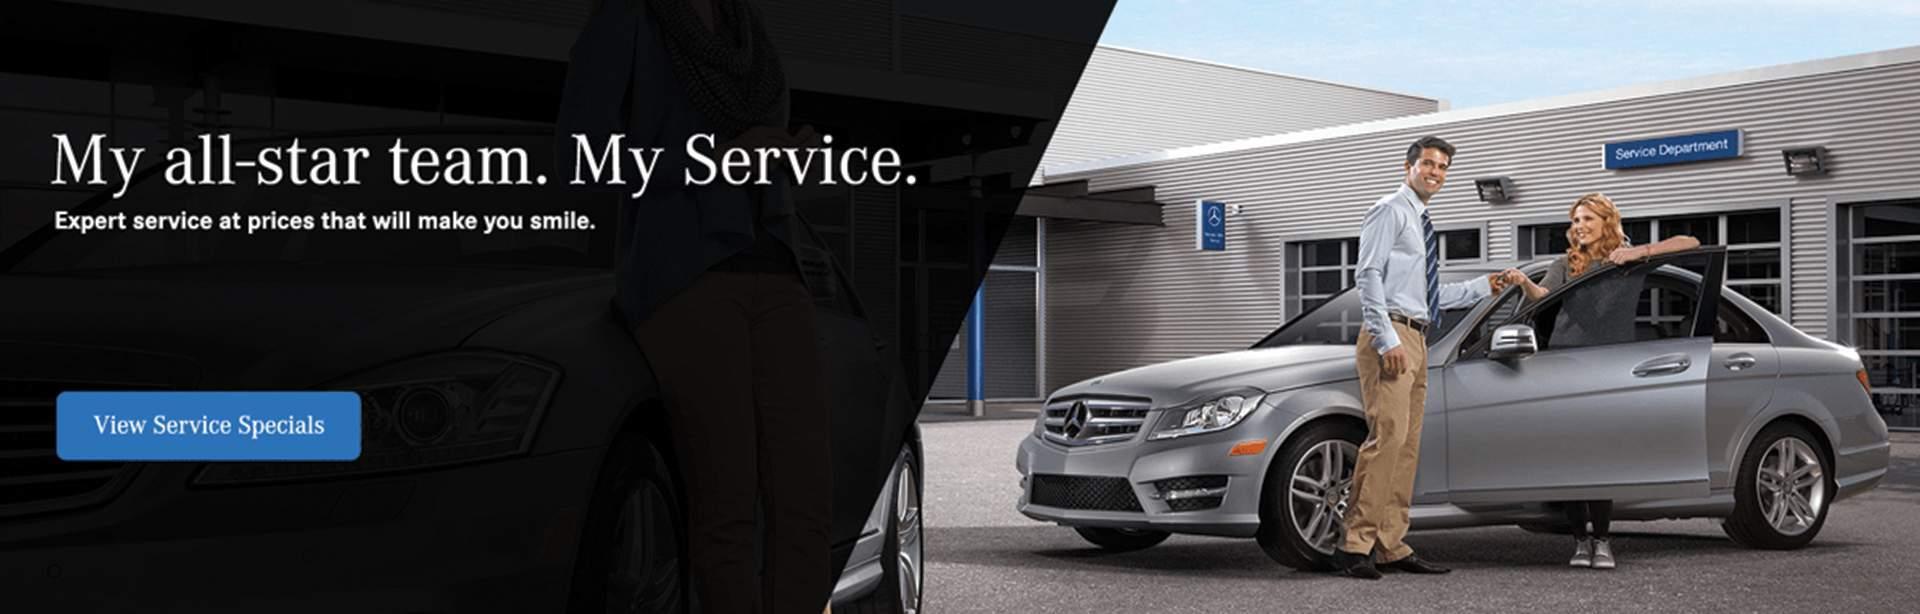 Mercedes Benz Dealer Traverse City Michigan Fiat World